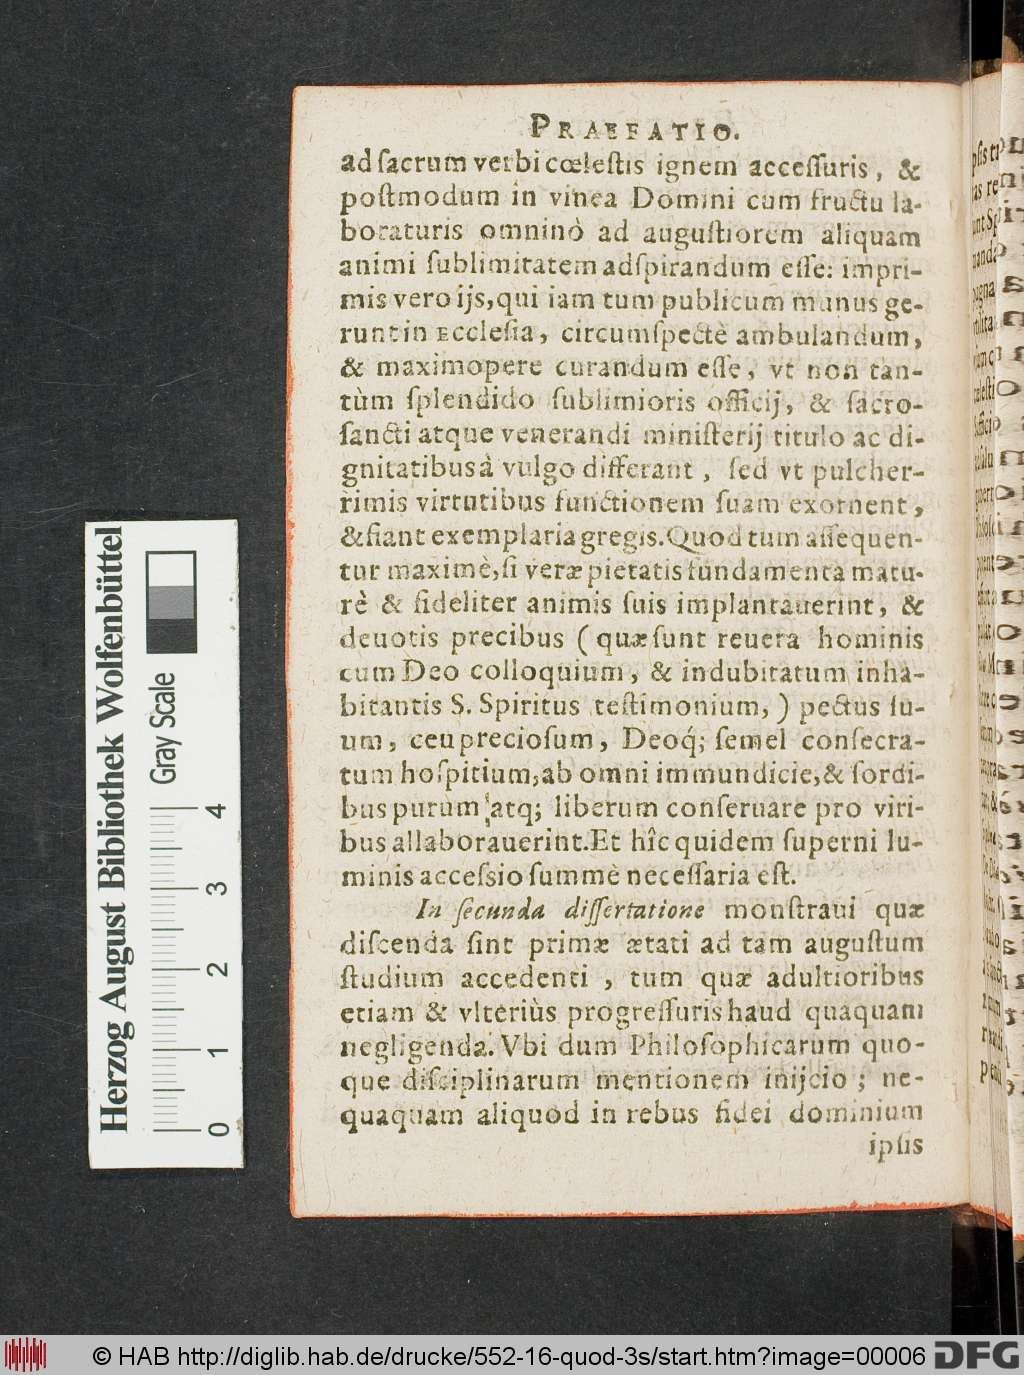 http://diglib.hab.de/drucke/552-16-quod-3s/00006.jpg